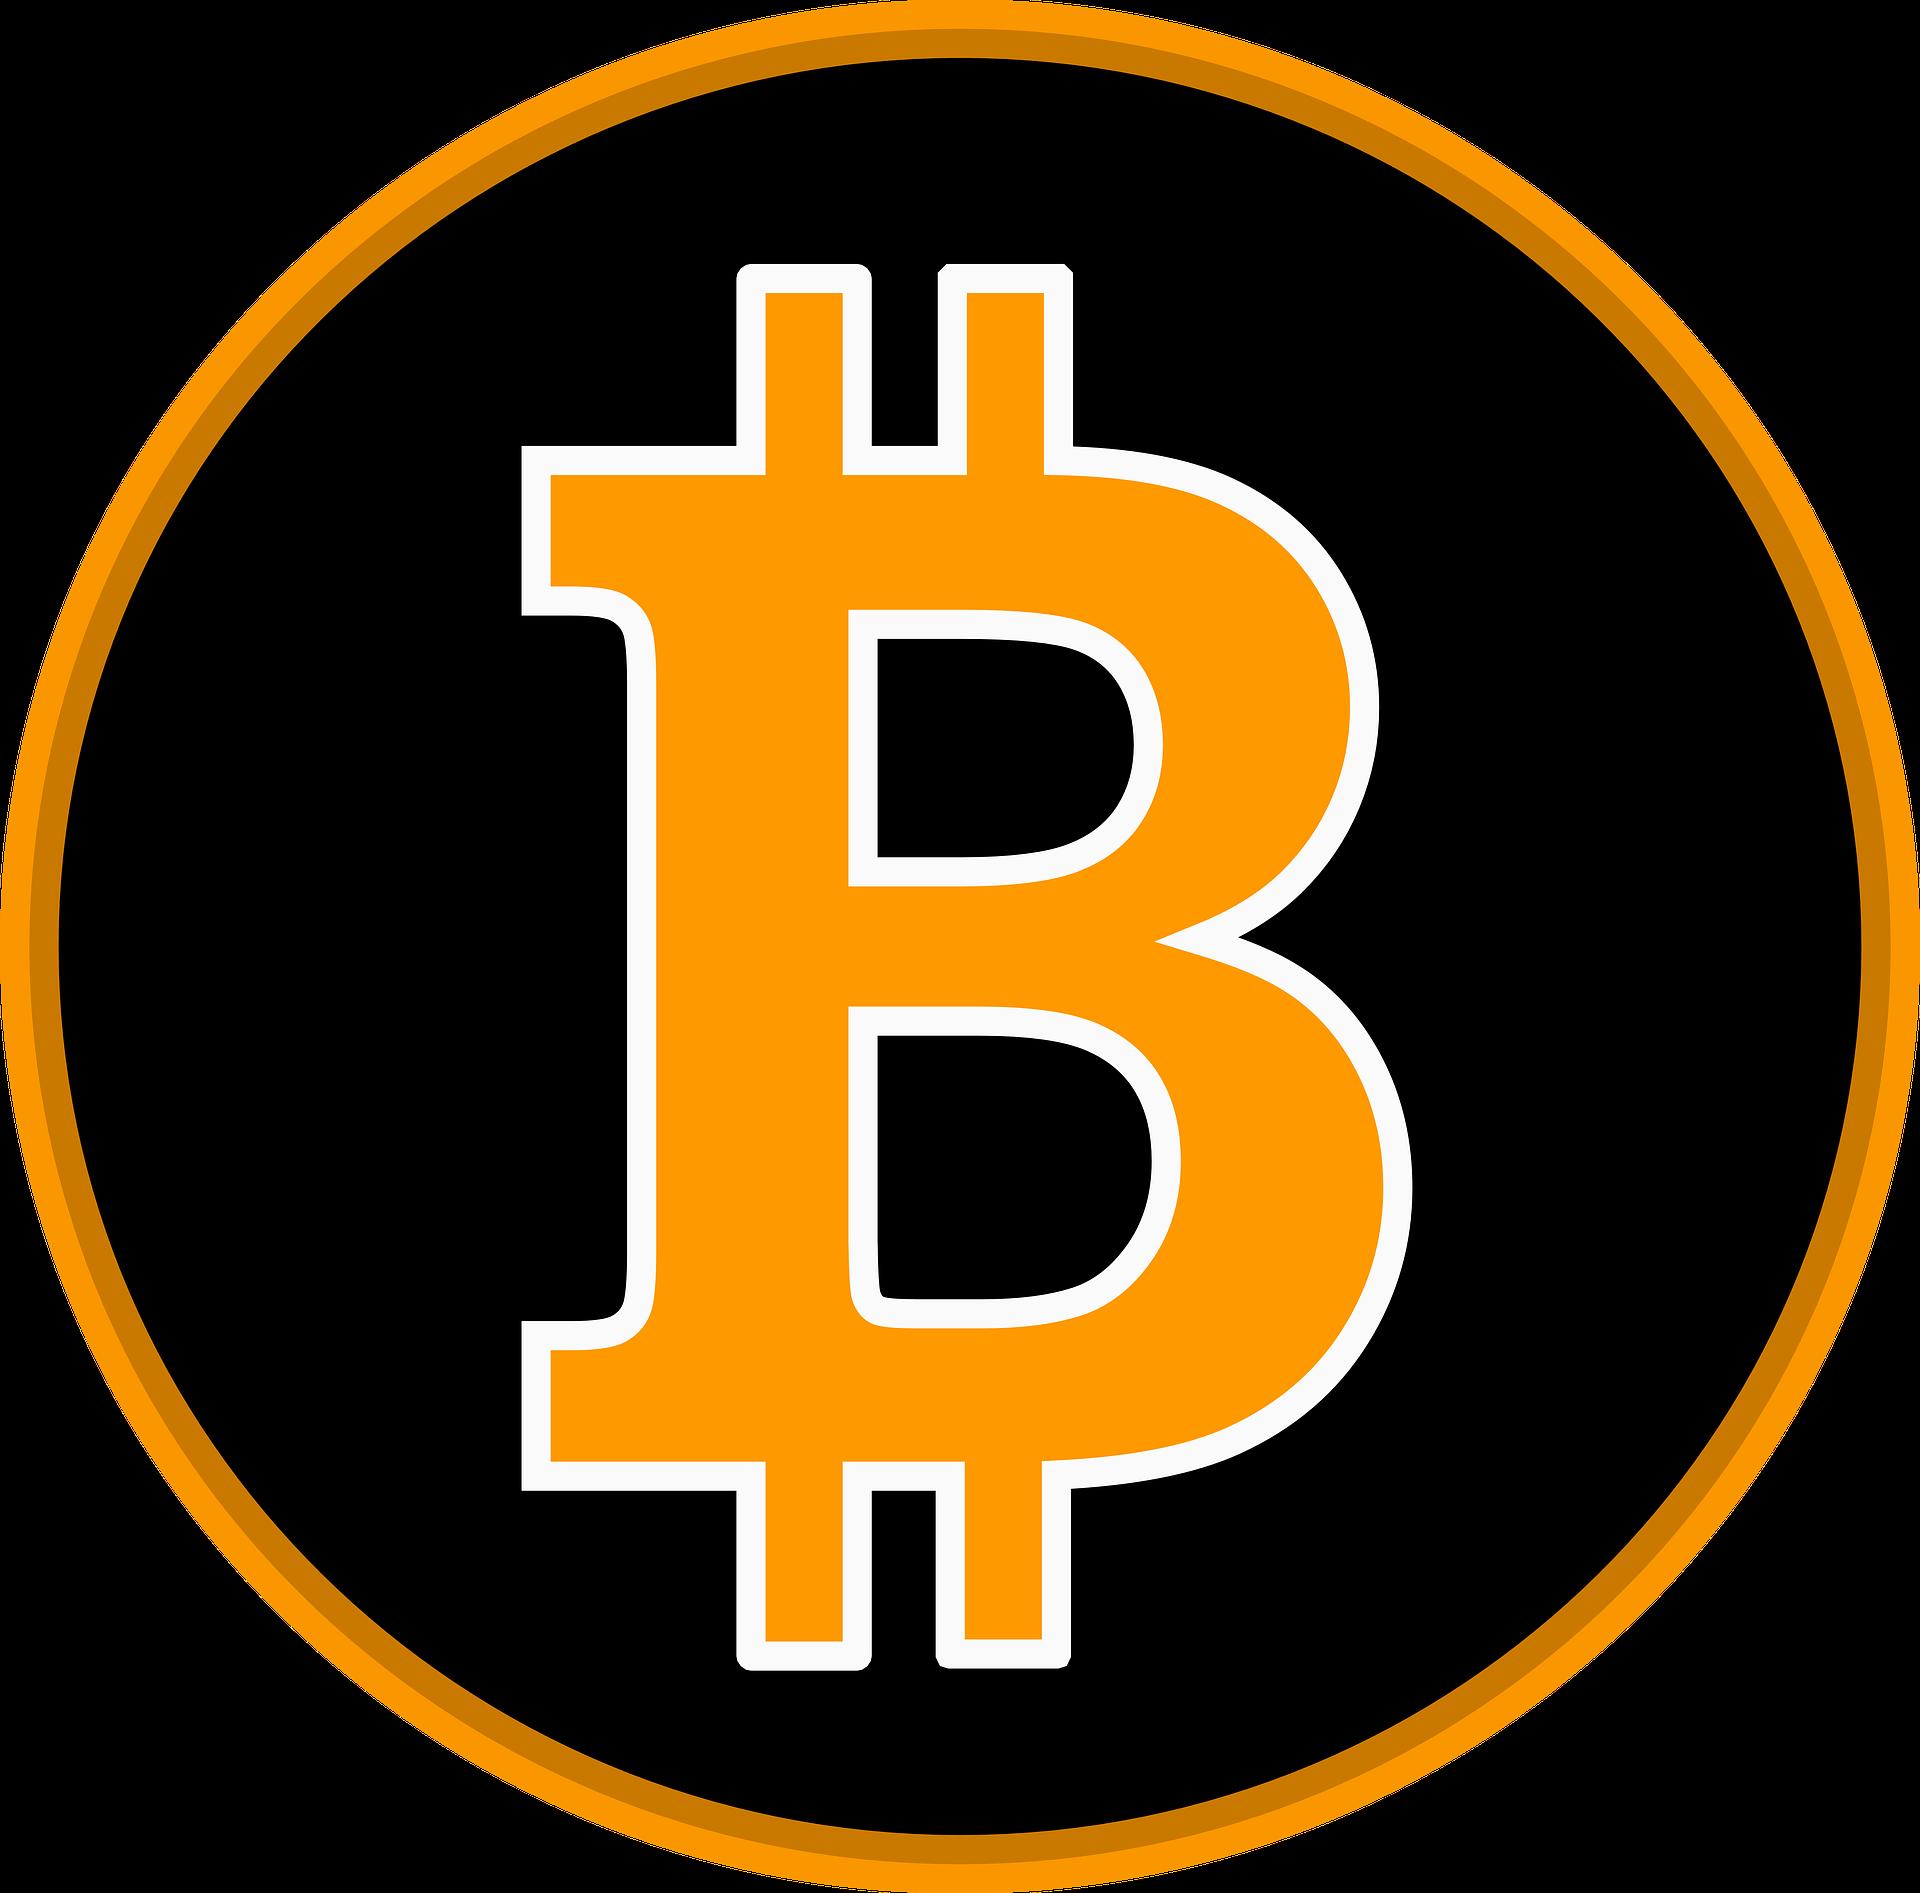 Suberg bitcoin will soon